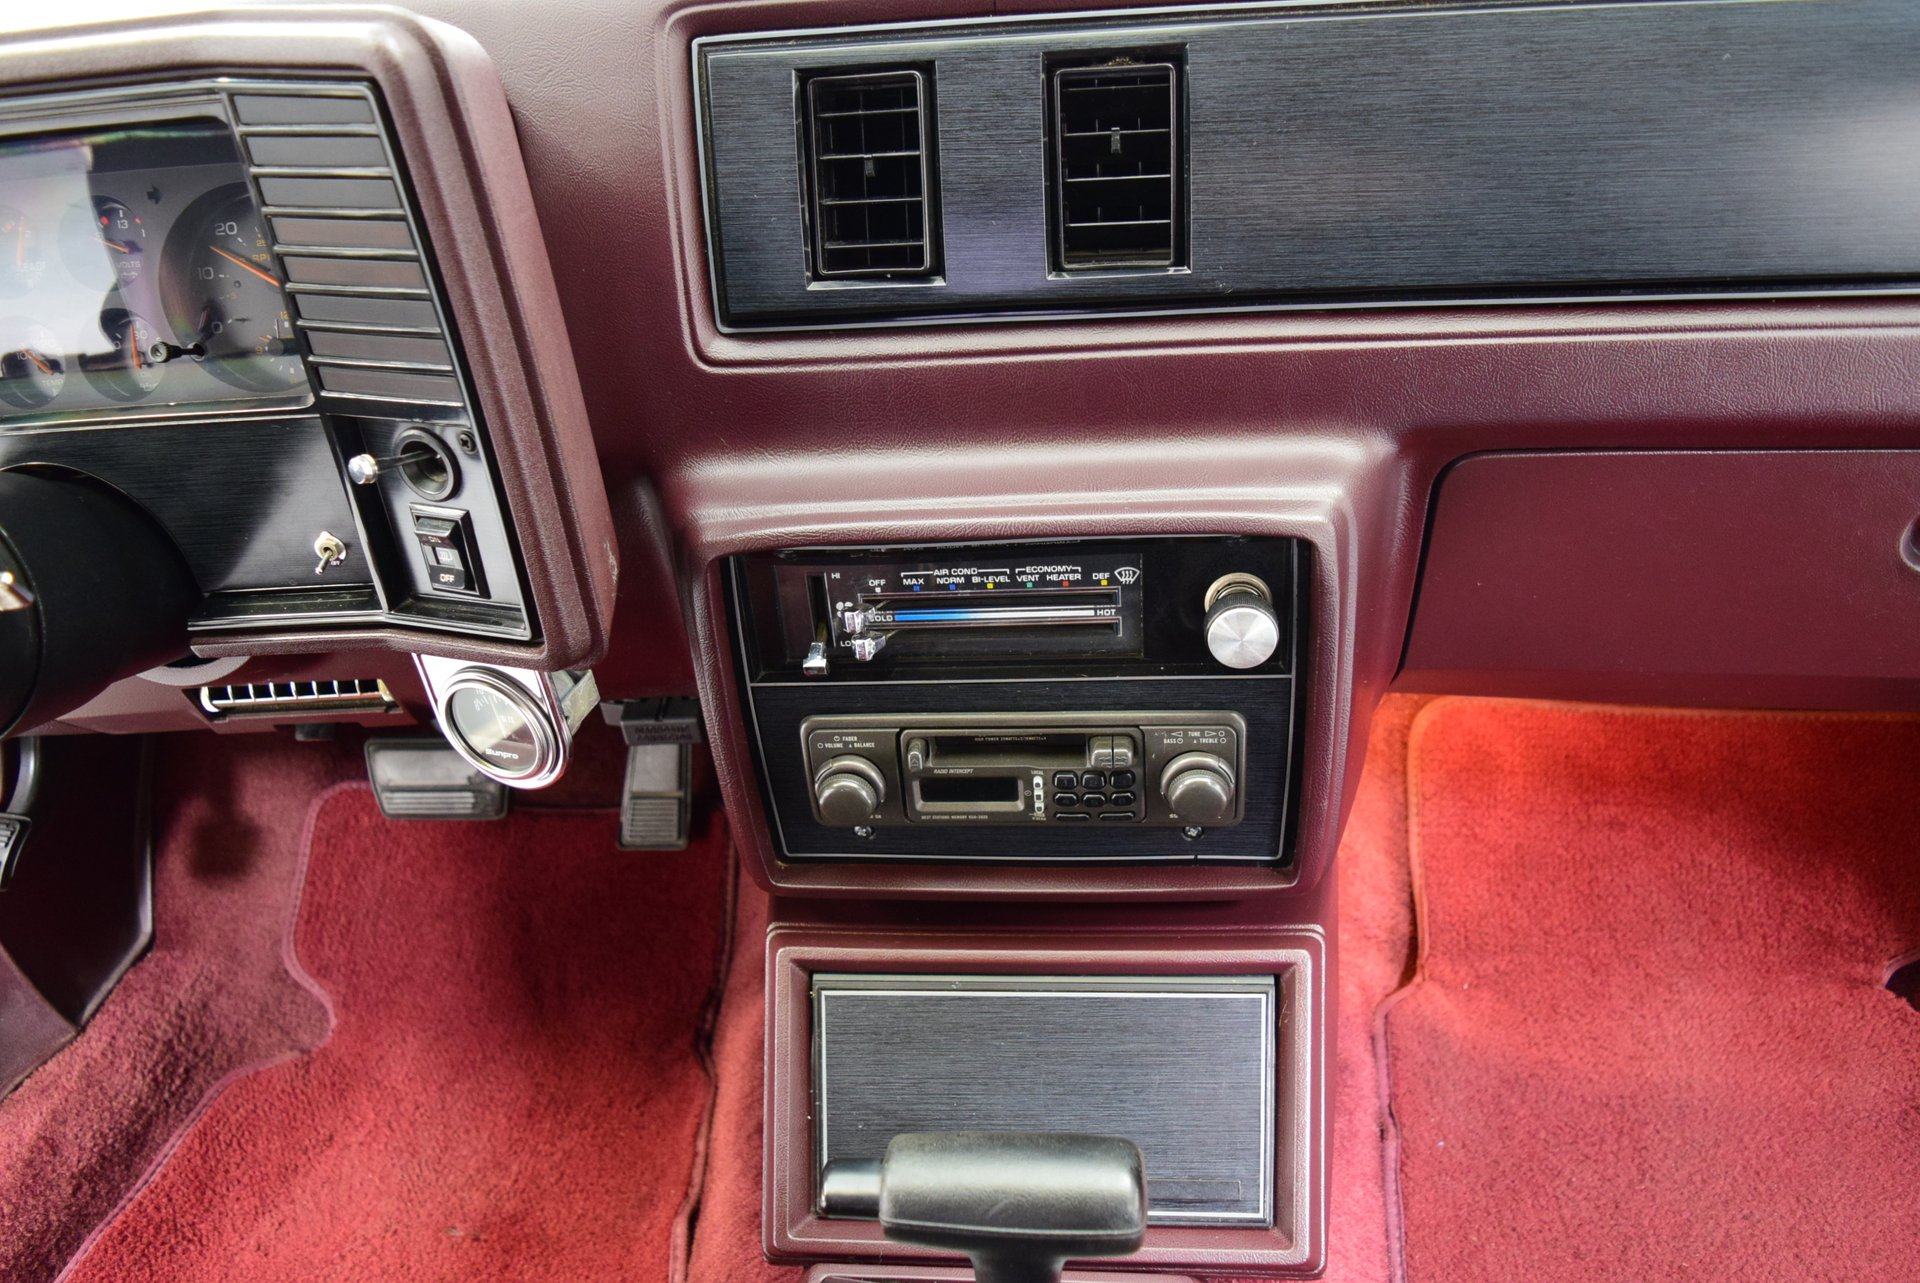 1985 Chevrolet Monte Carlo SS for sale #74697 | MCG